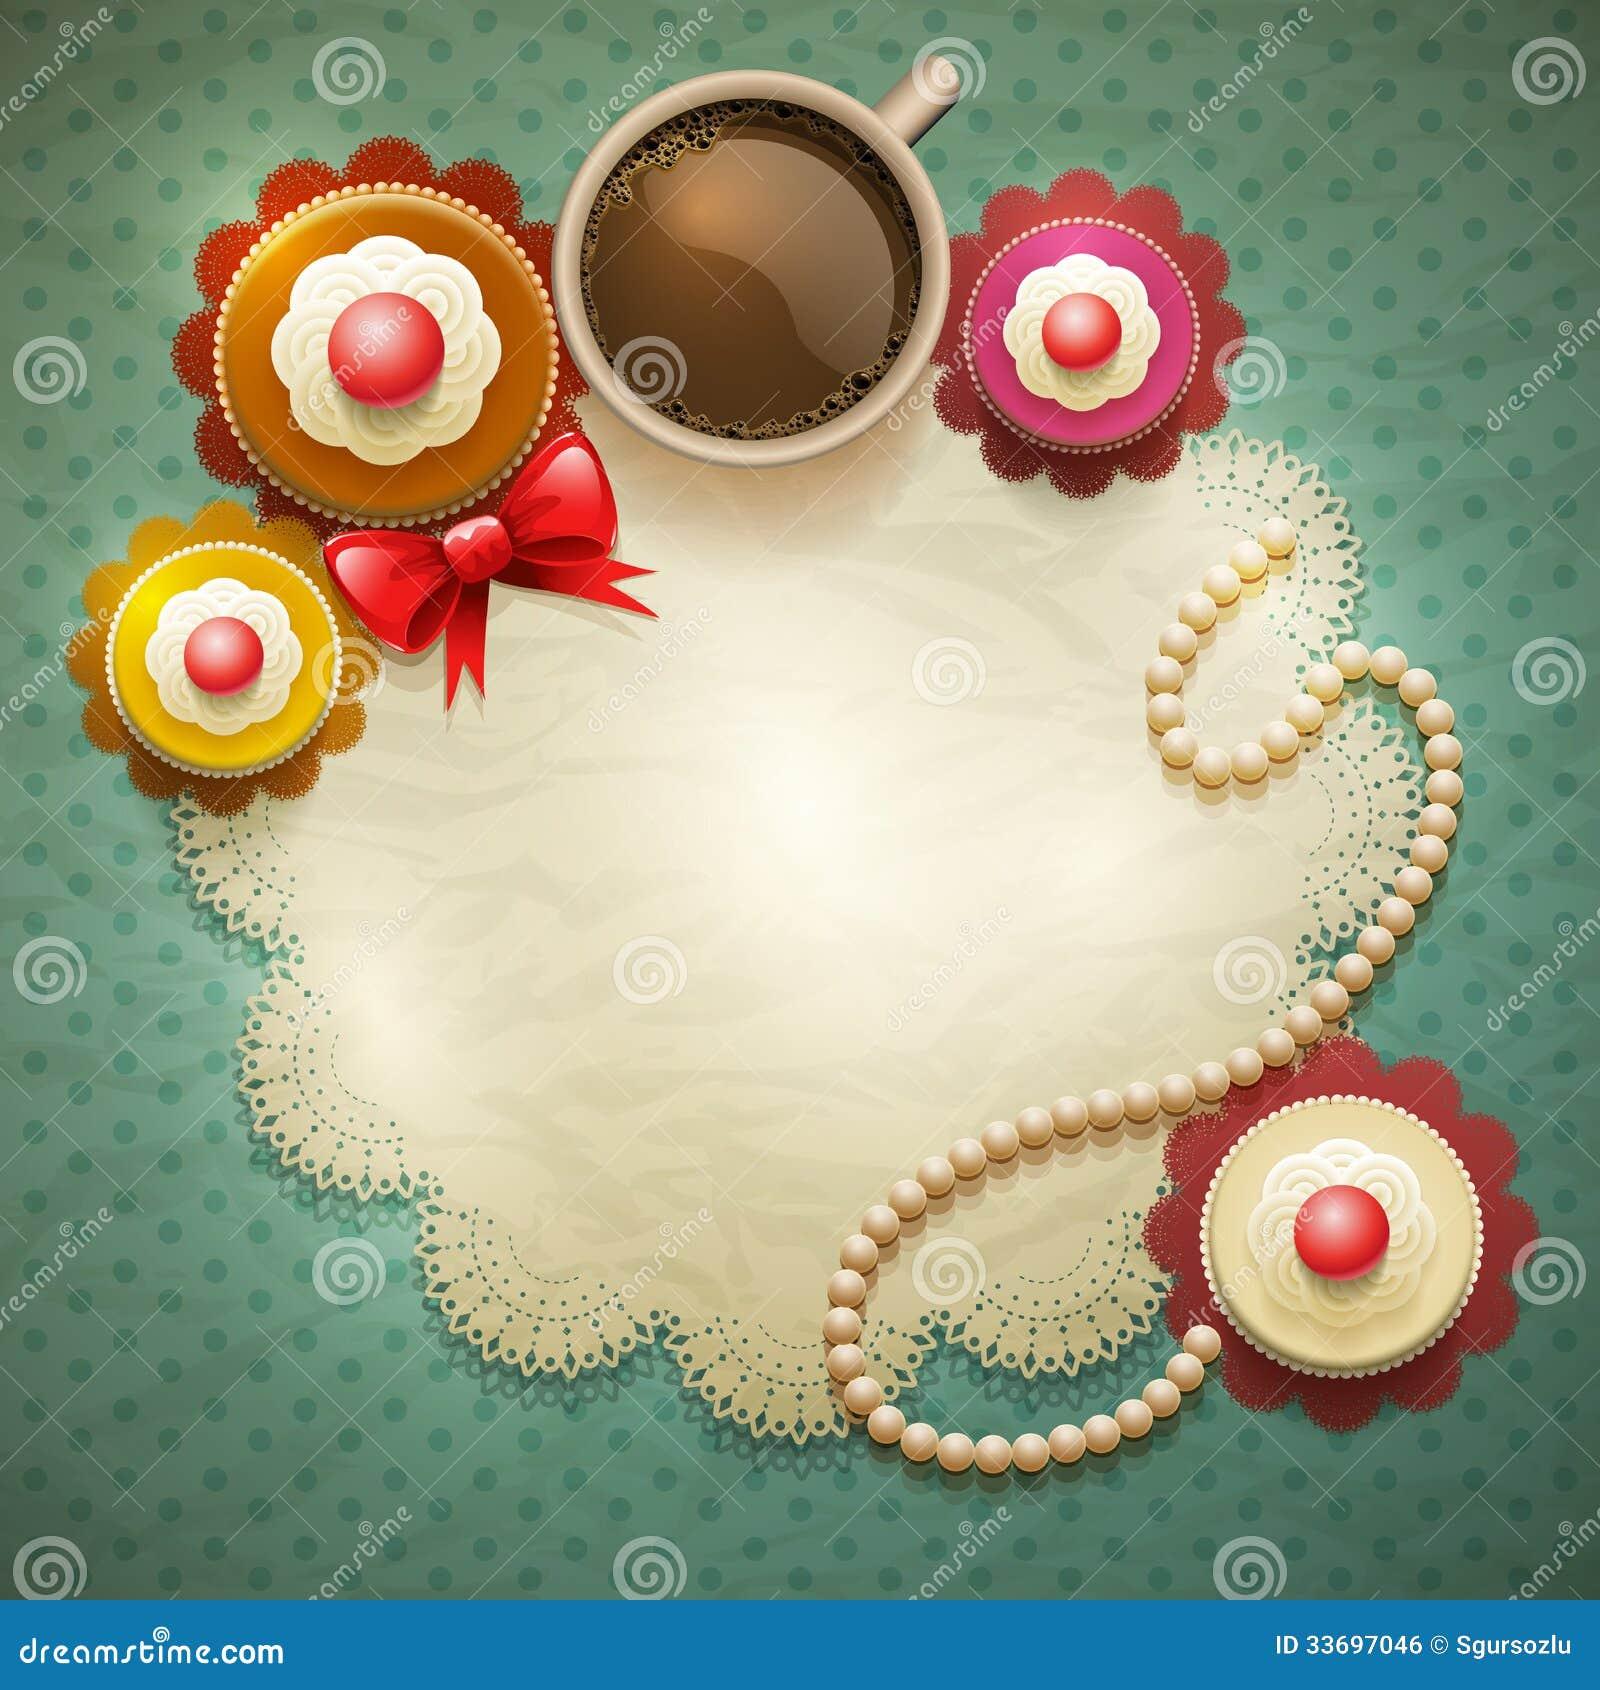 Sweet Cupcakes Background Royalty Free Stock Image Image